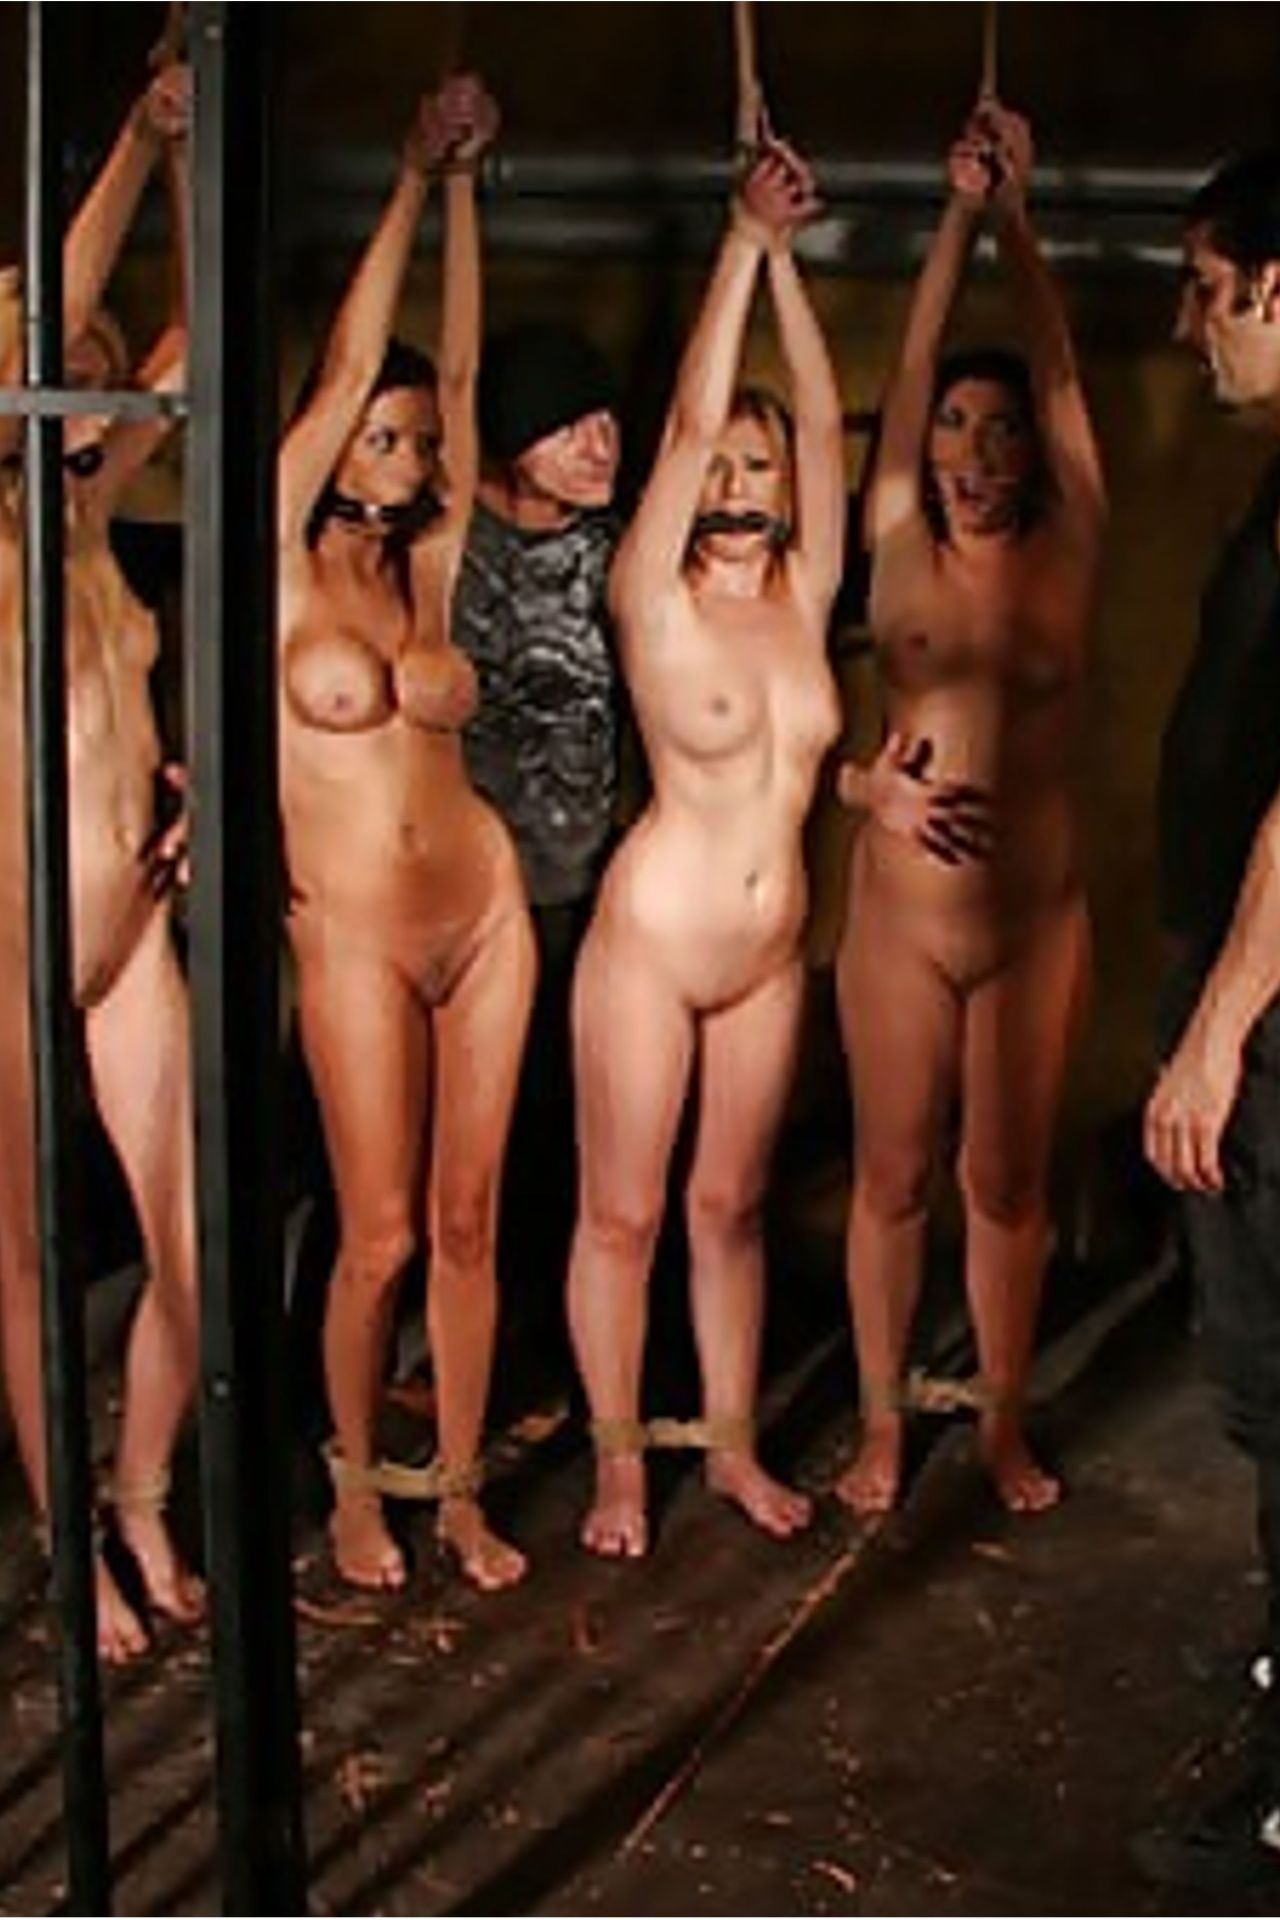 tumblr lesbian sex slave